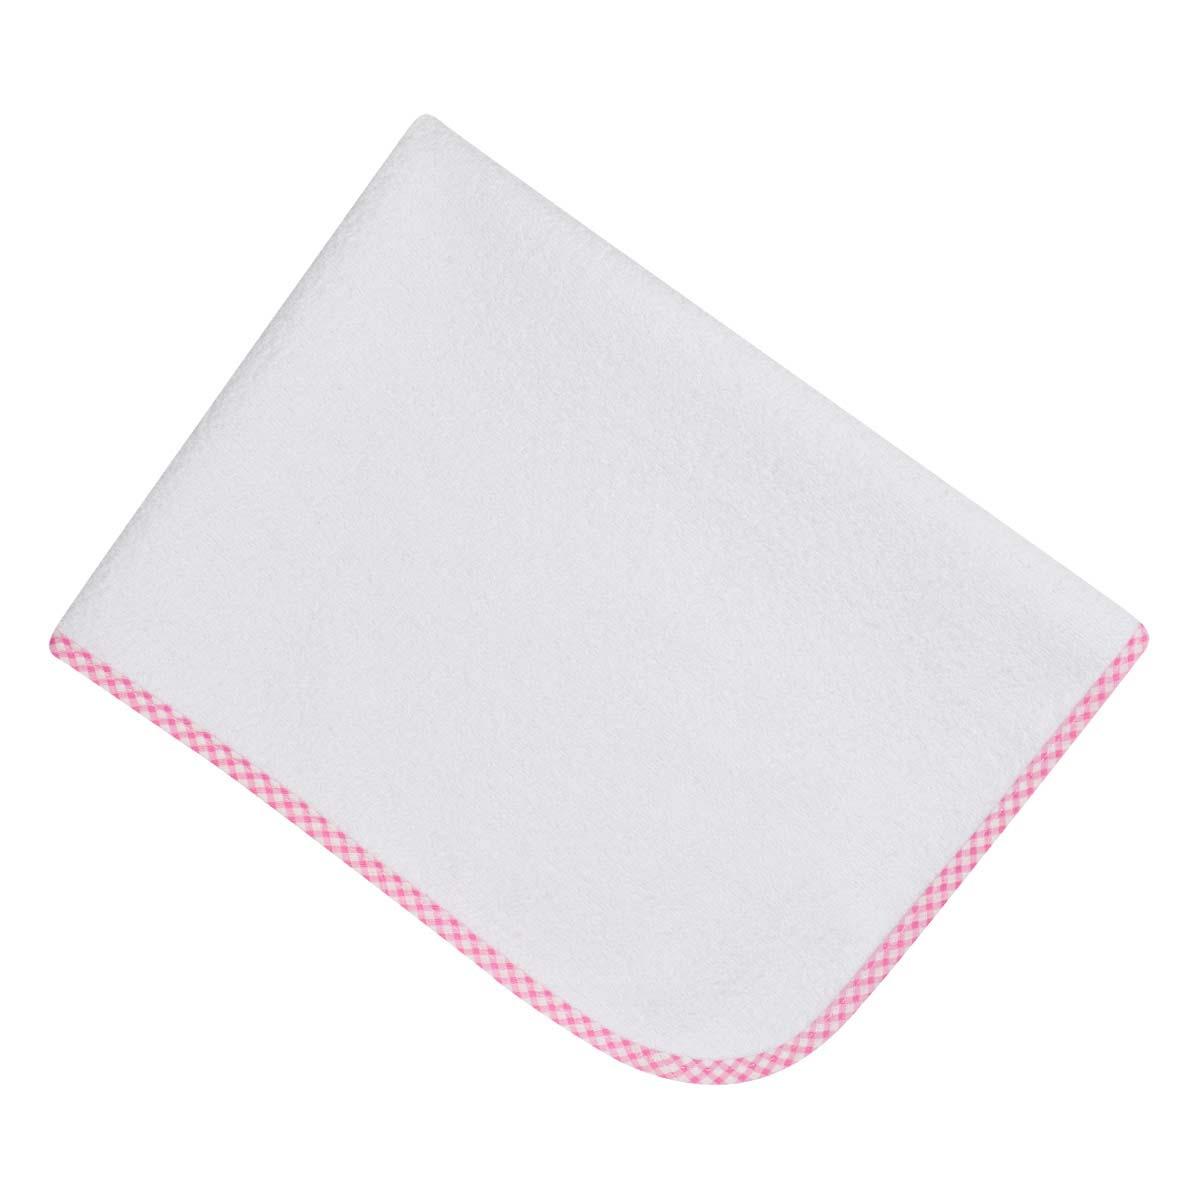 Bunny bebe σελτεδάκι 45×65 με ρέλι ροζ καρό